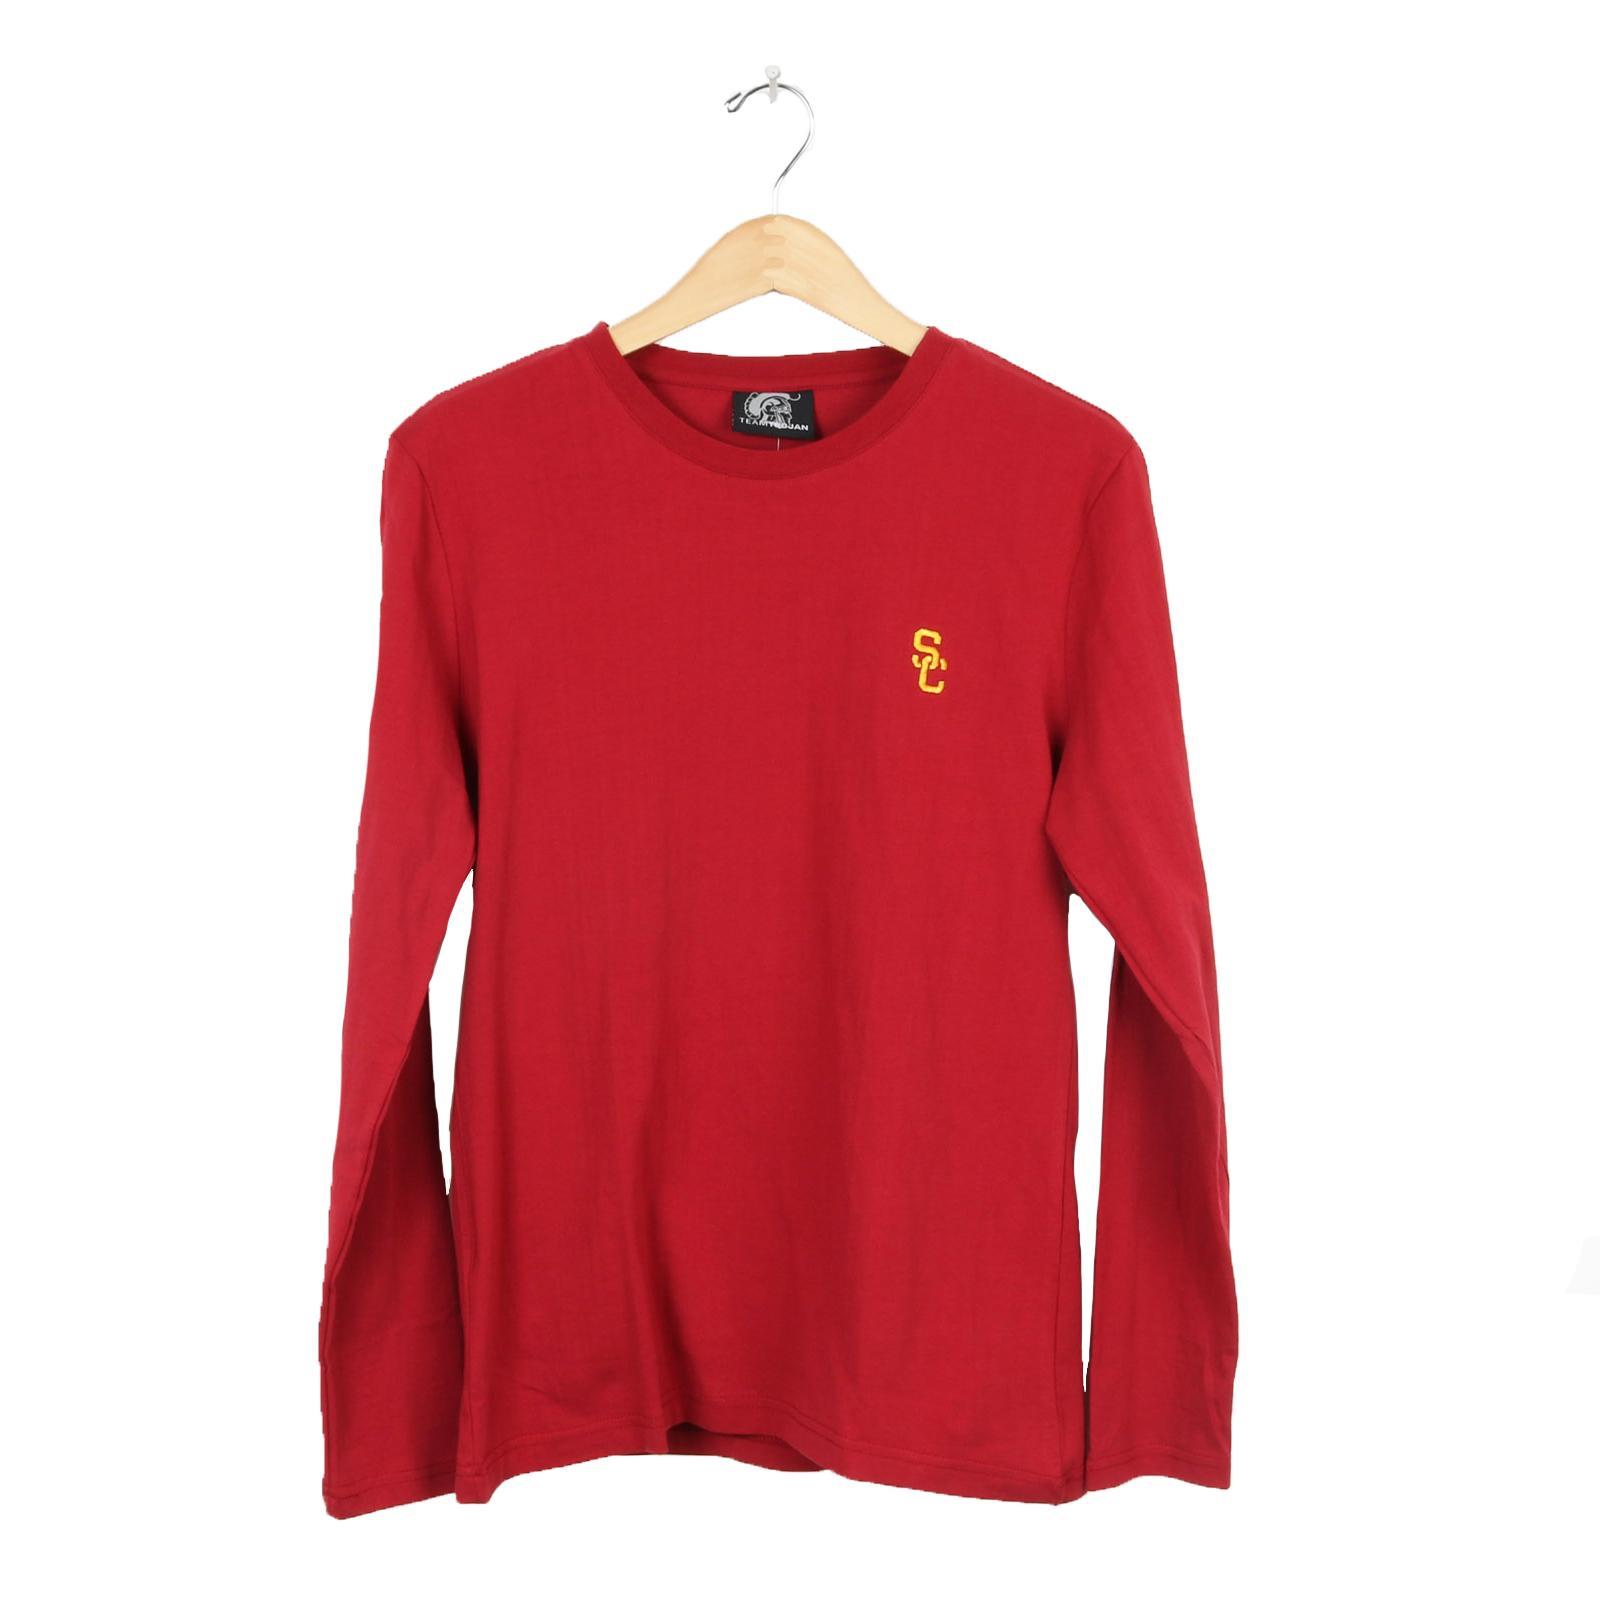 222fbc1cdaa USC Trojans Basics SC Interlock Embroidered Long Sleeve T-Shirt